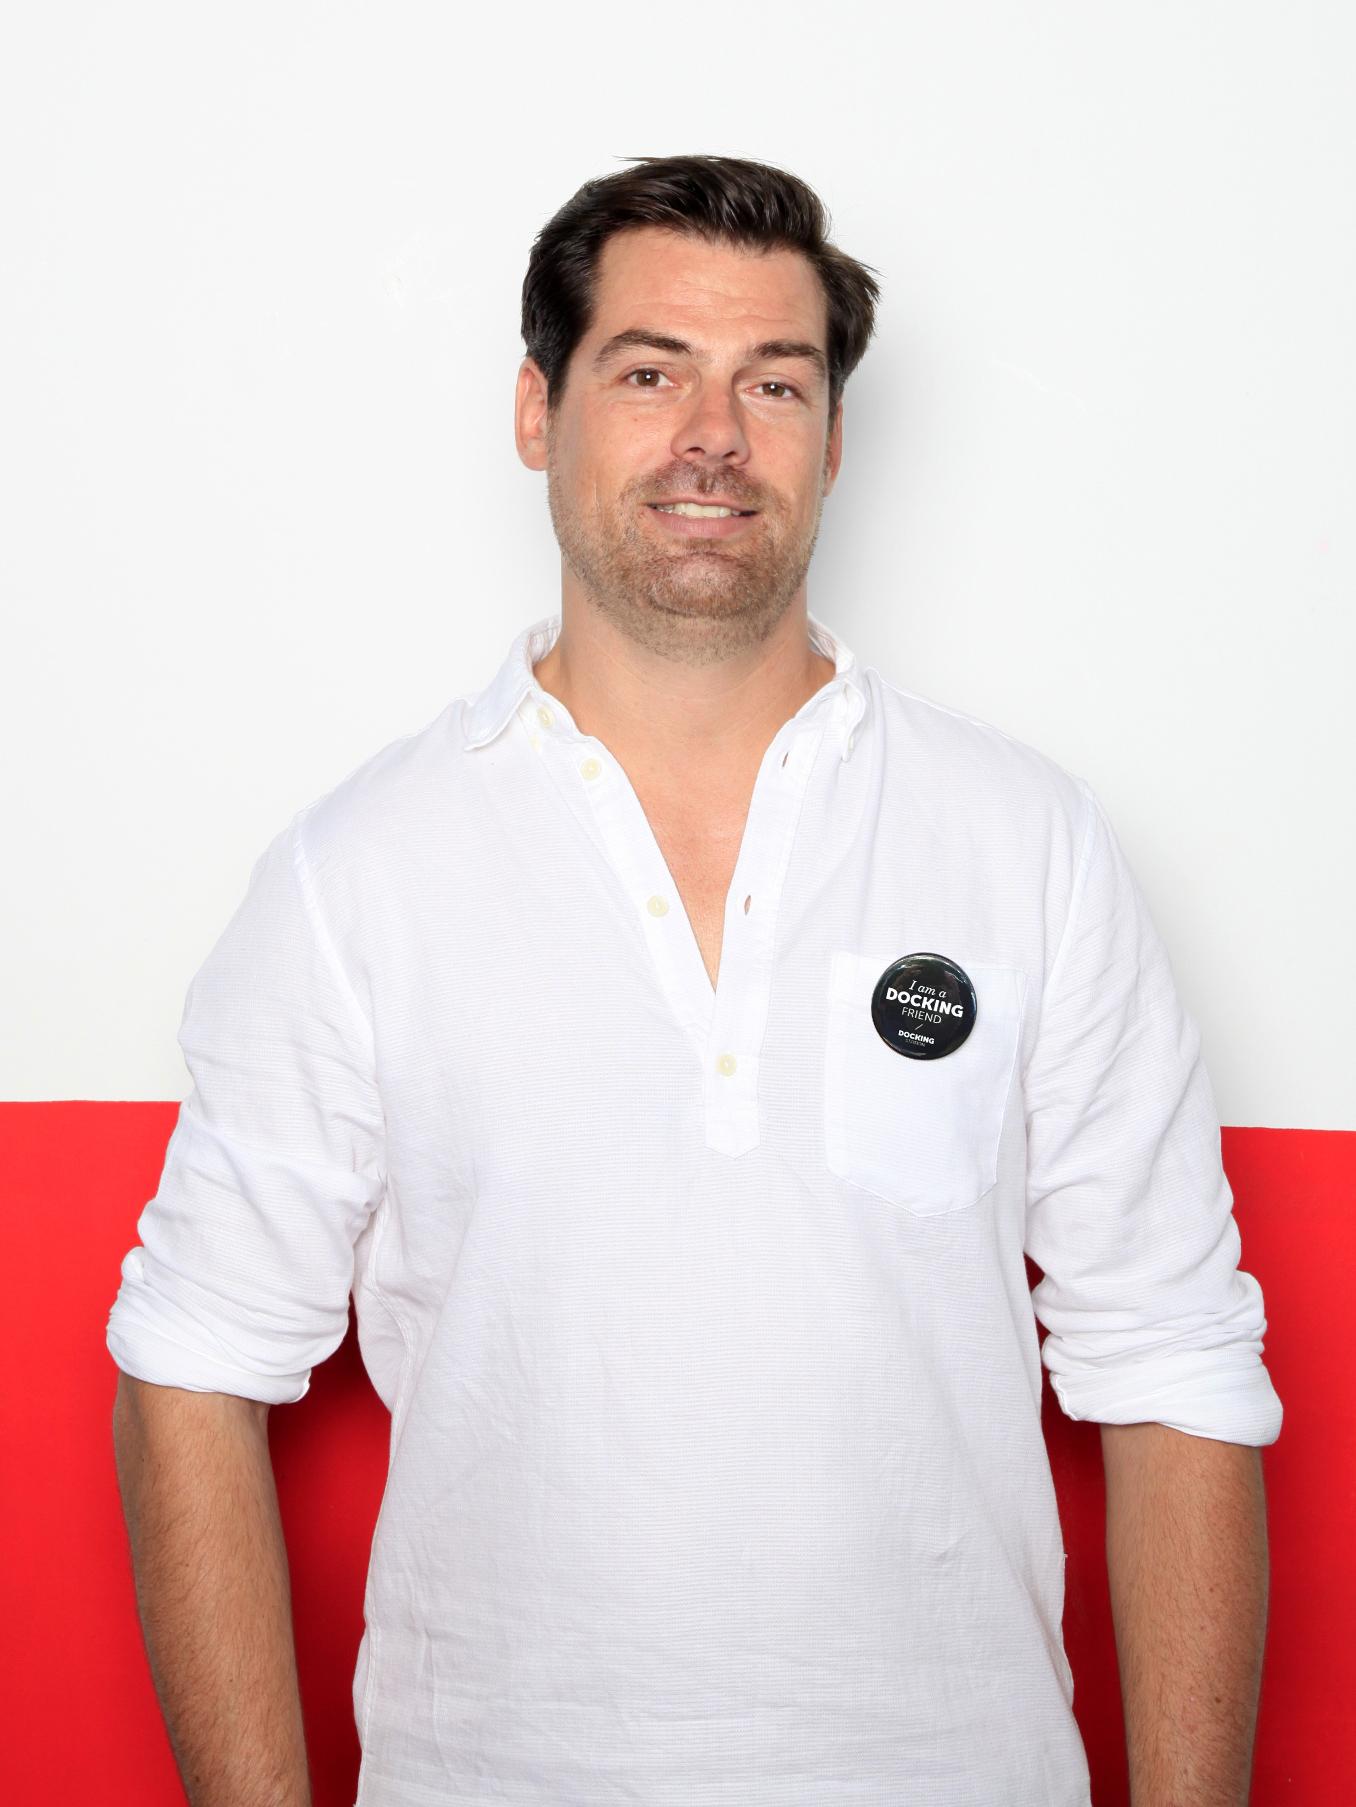 Alexander Dors